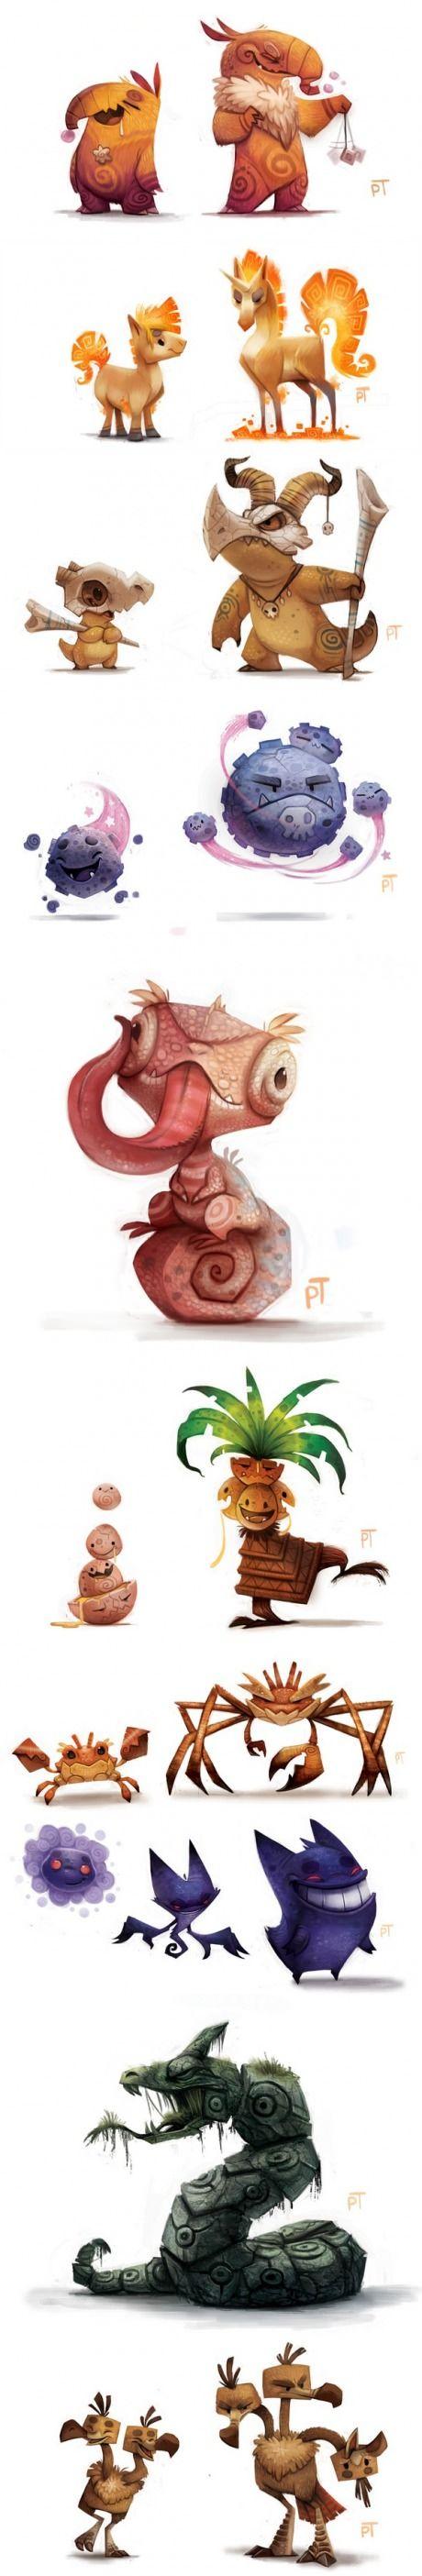 Pokémon according to Piper Thibodeau. Quite an interesting art style.